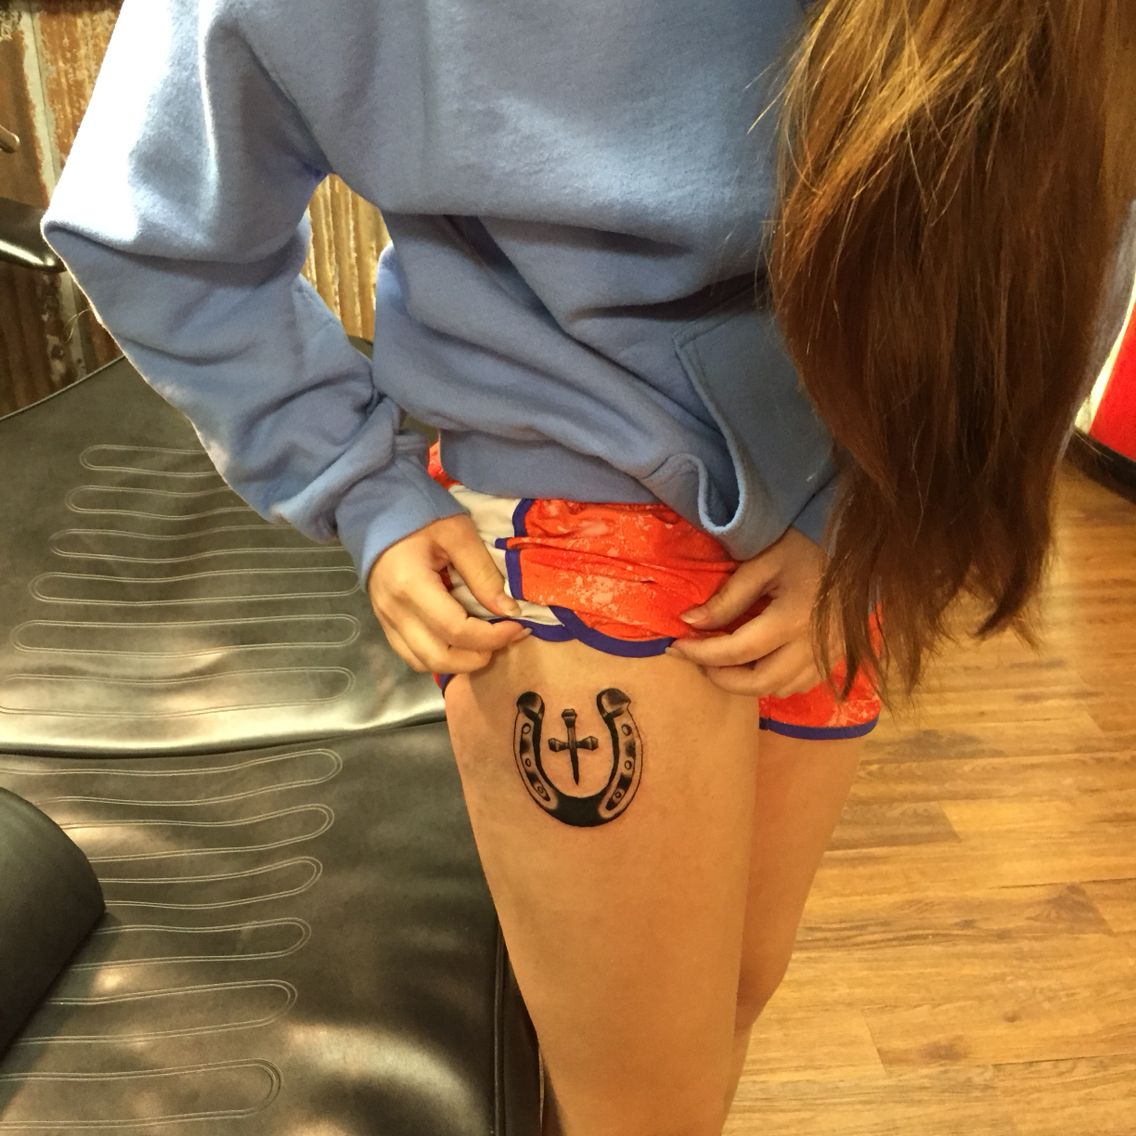 My tattoo! Horseshoe plus horseshoe nail cross